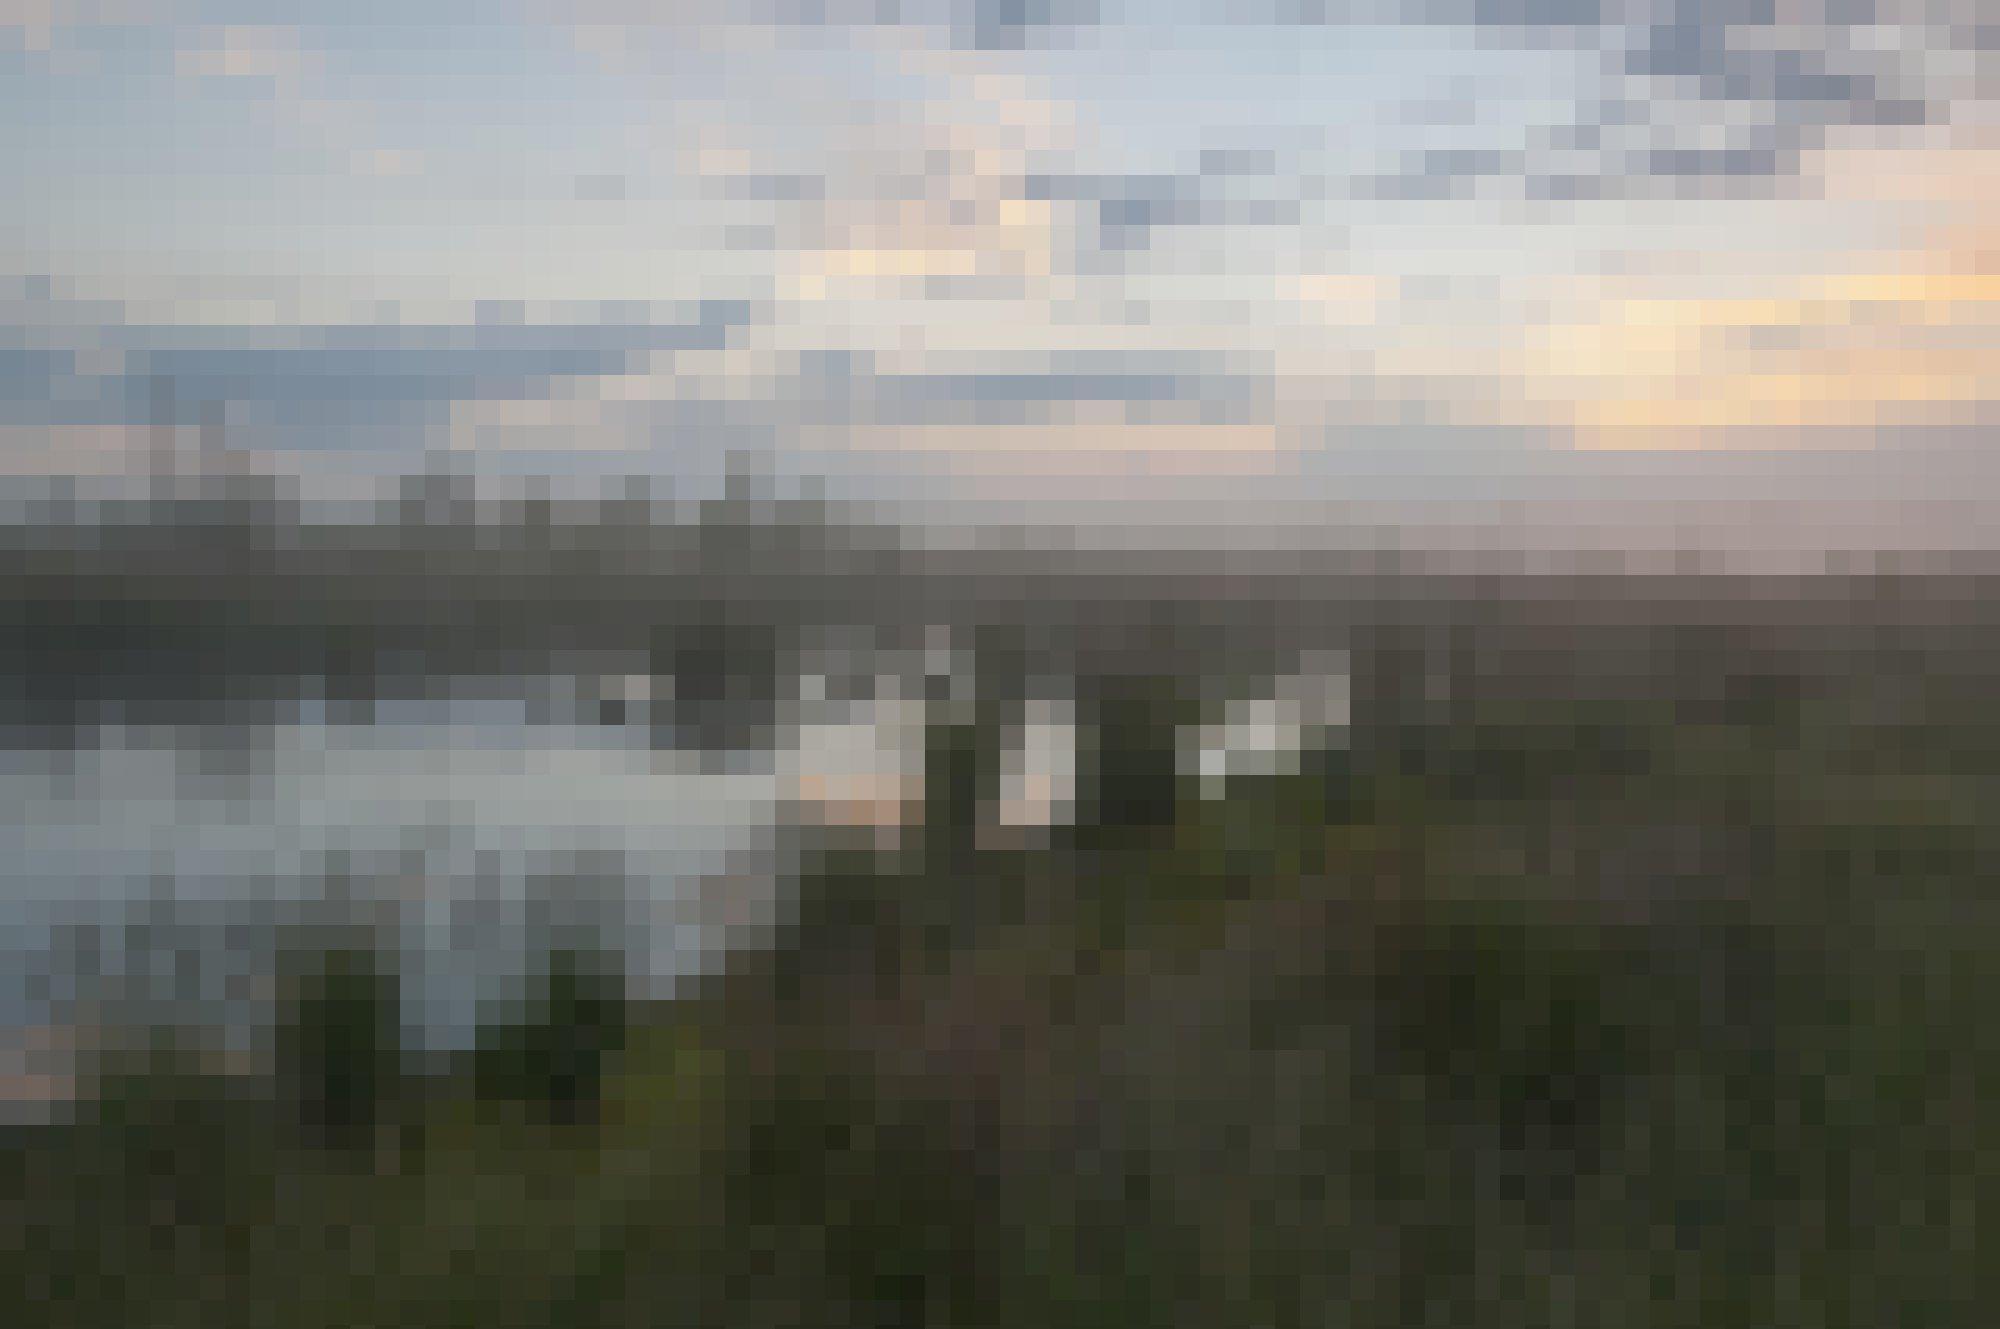 Moorlandschaft mit Tümpel im Nebel